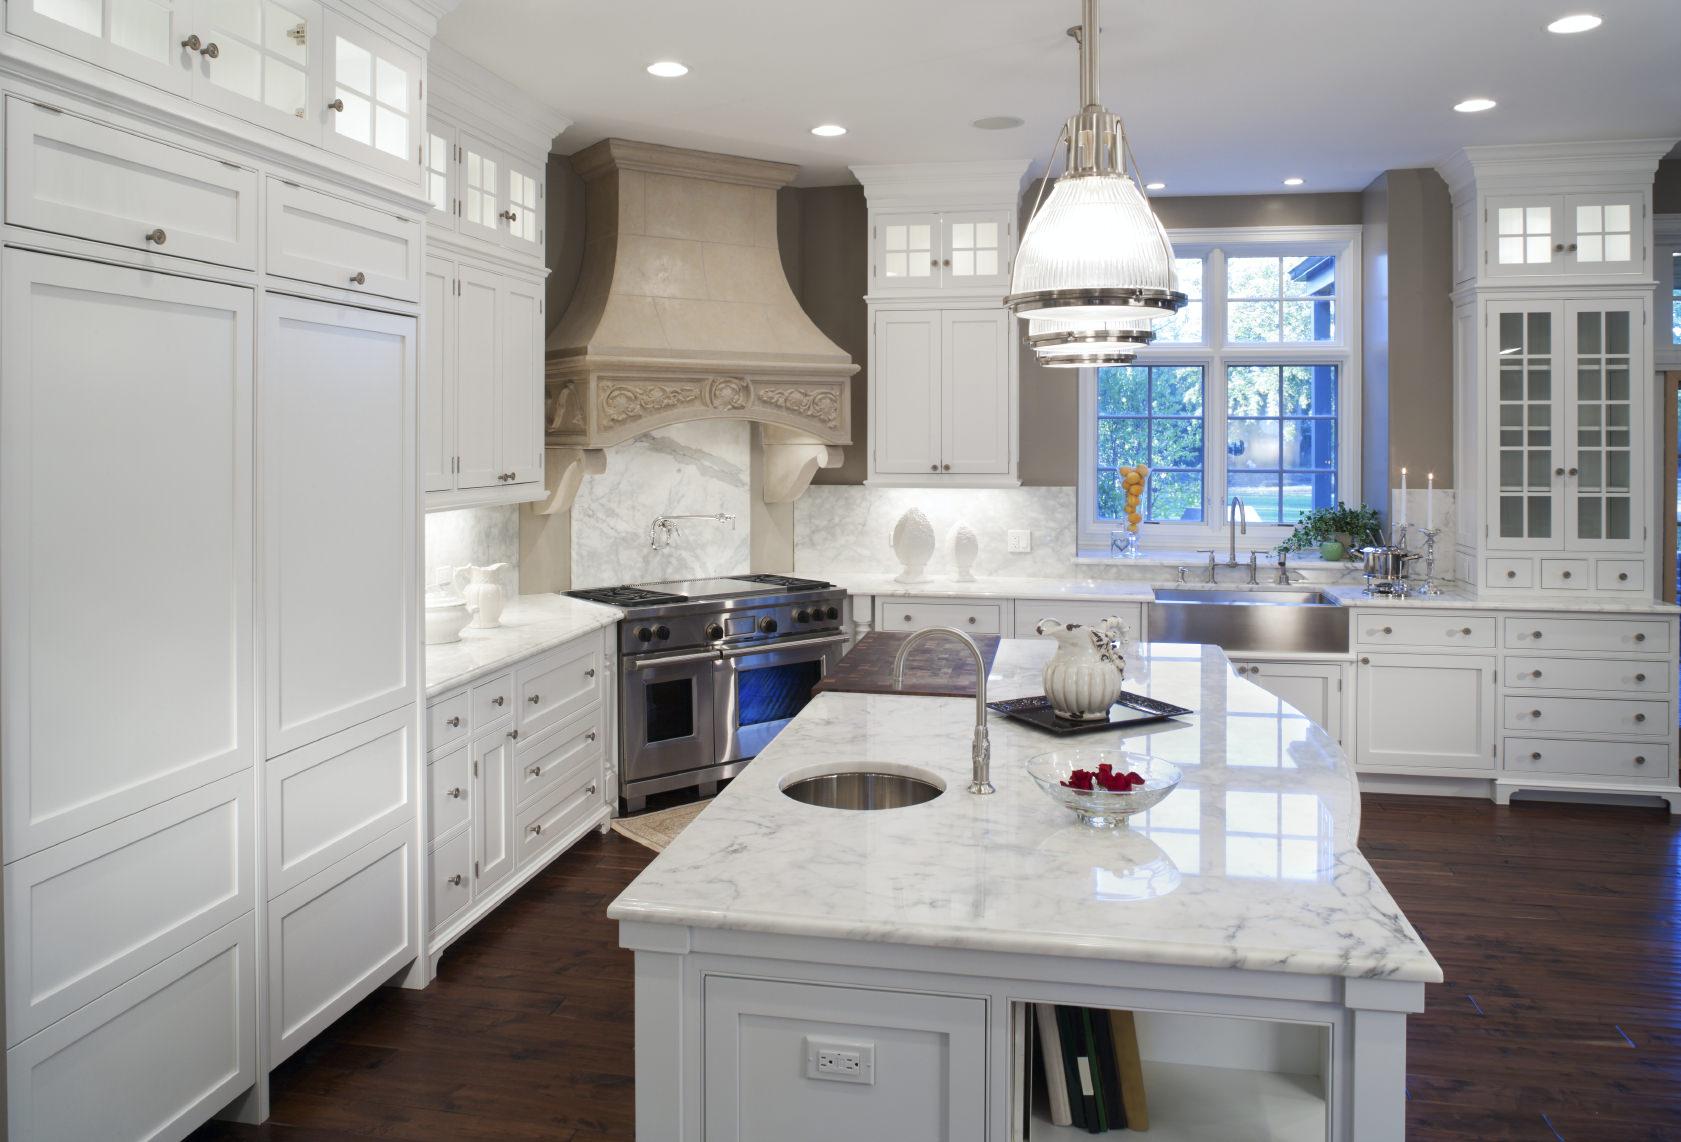 70 Transitional Kitchen Ideas Photos